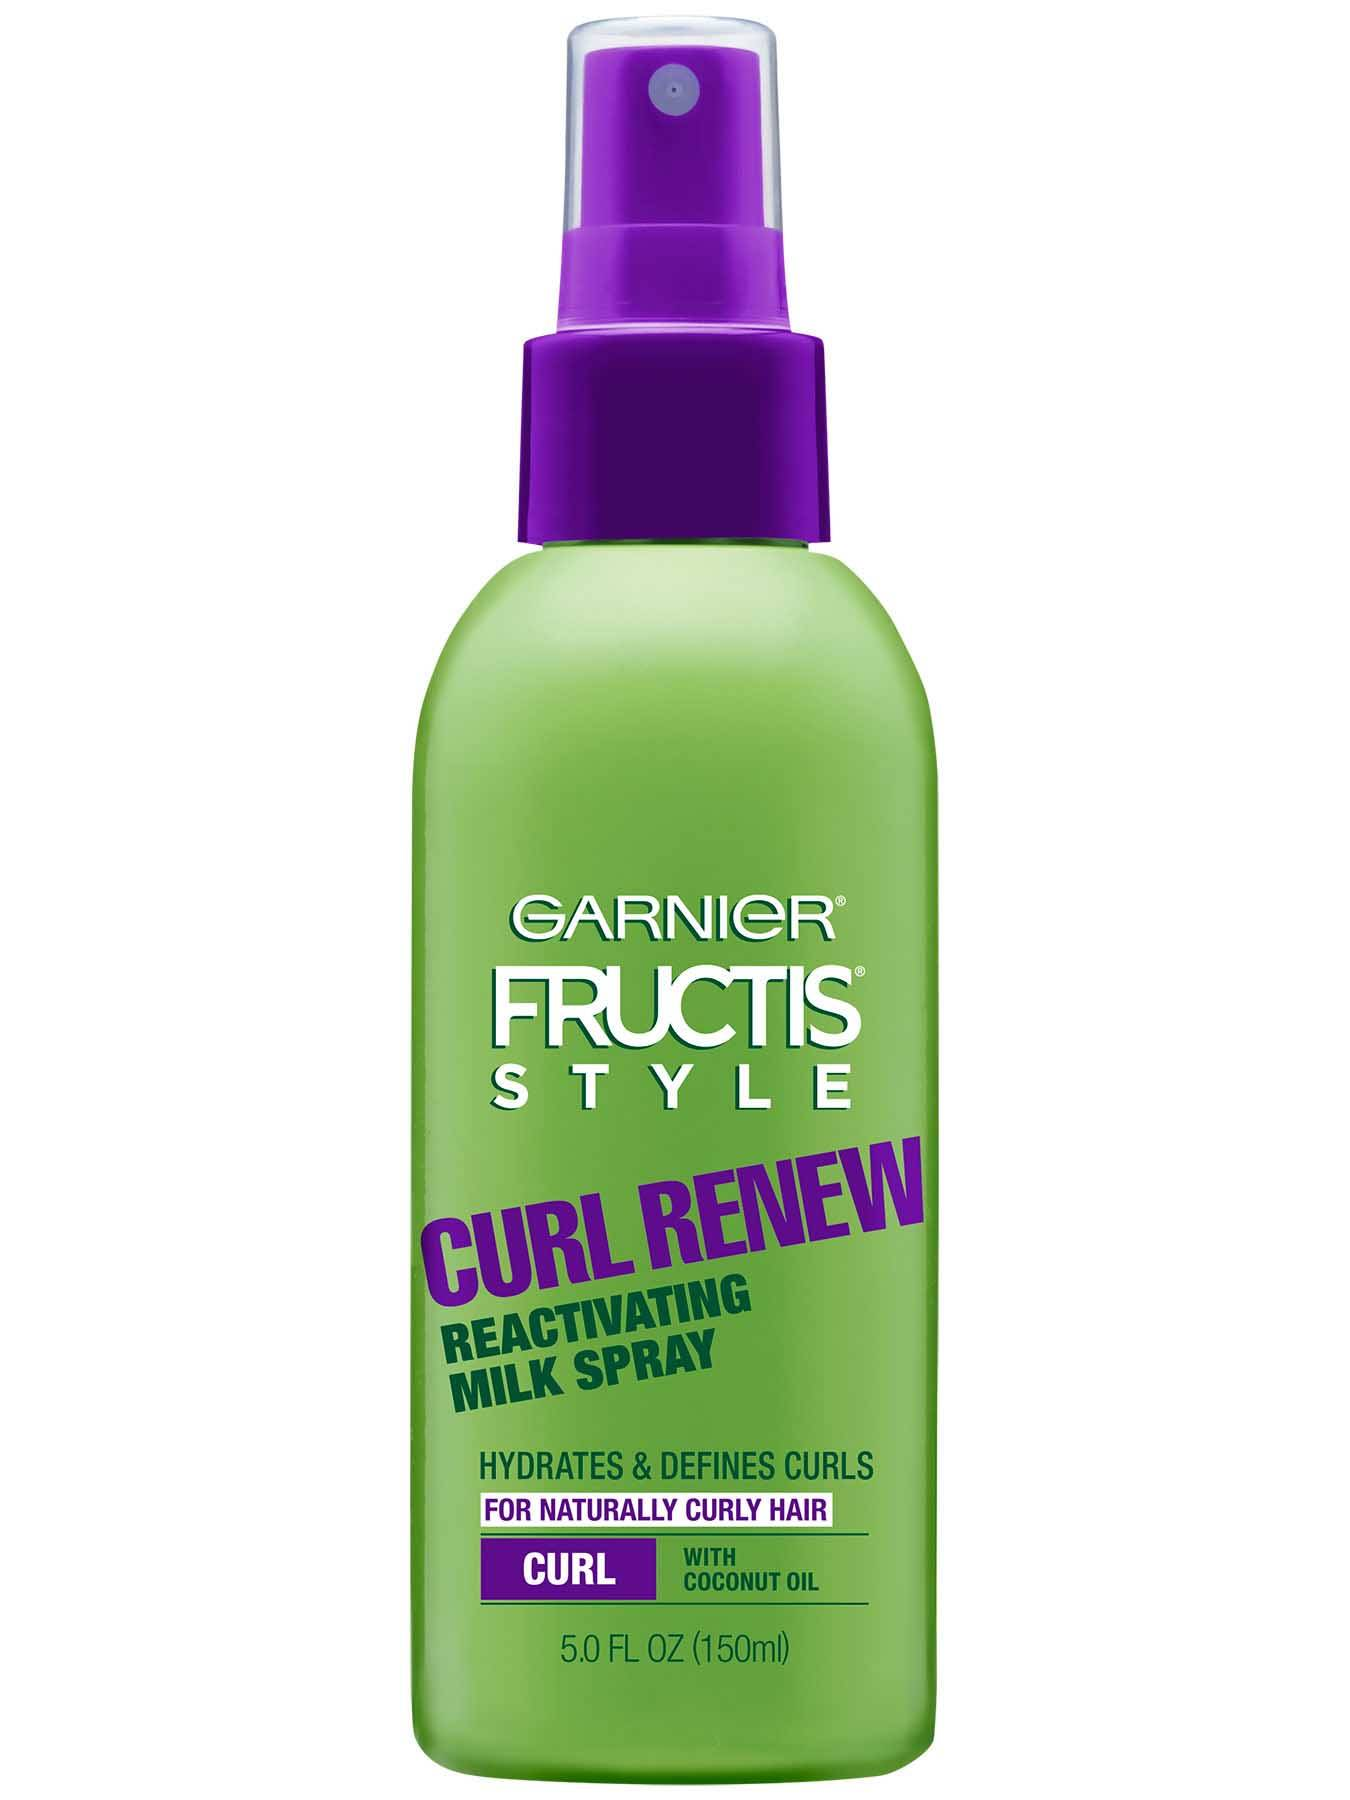 Curl Renew Reactivating Milk Hair Spray Garnier Fructis